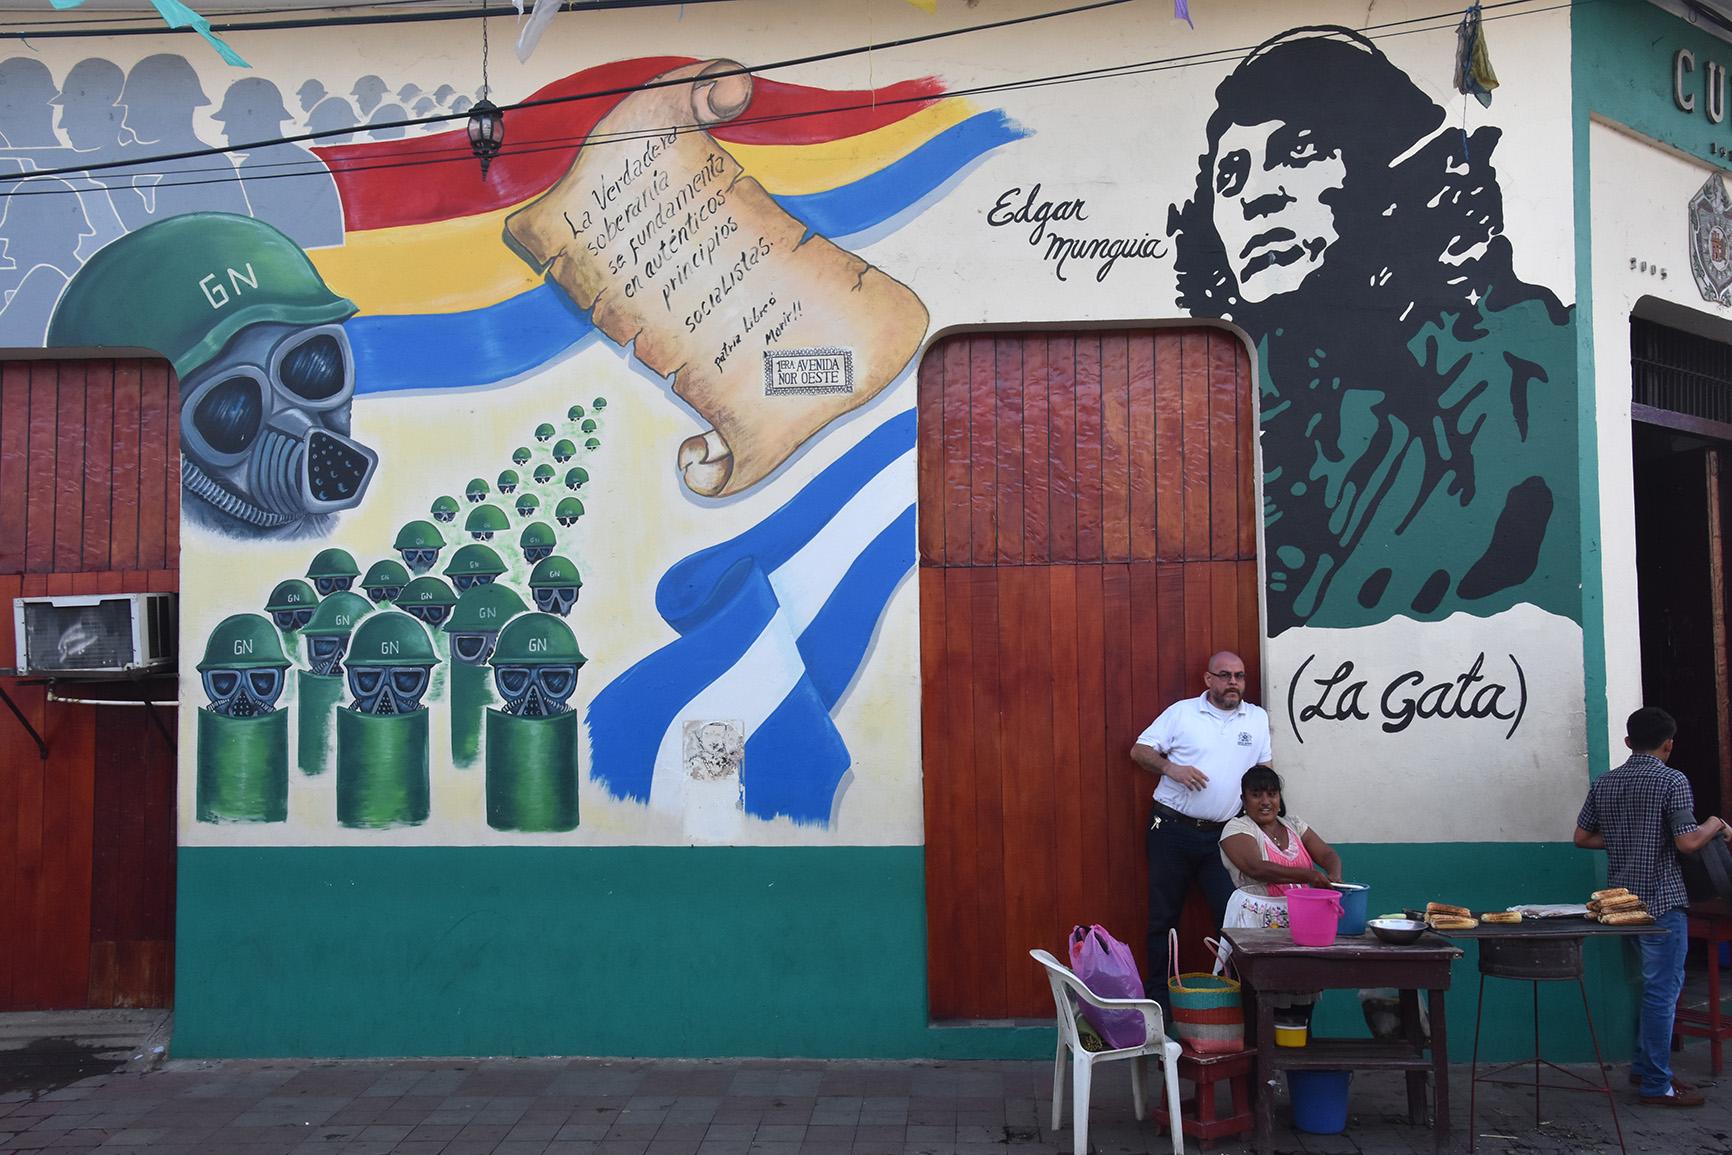 leon-revolution-mural-copyright-jono-vernon-powell